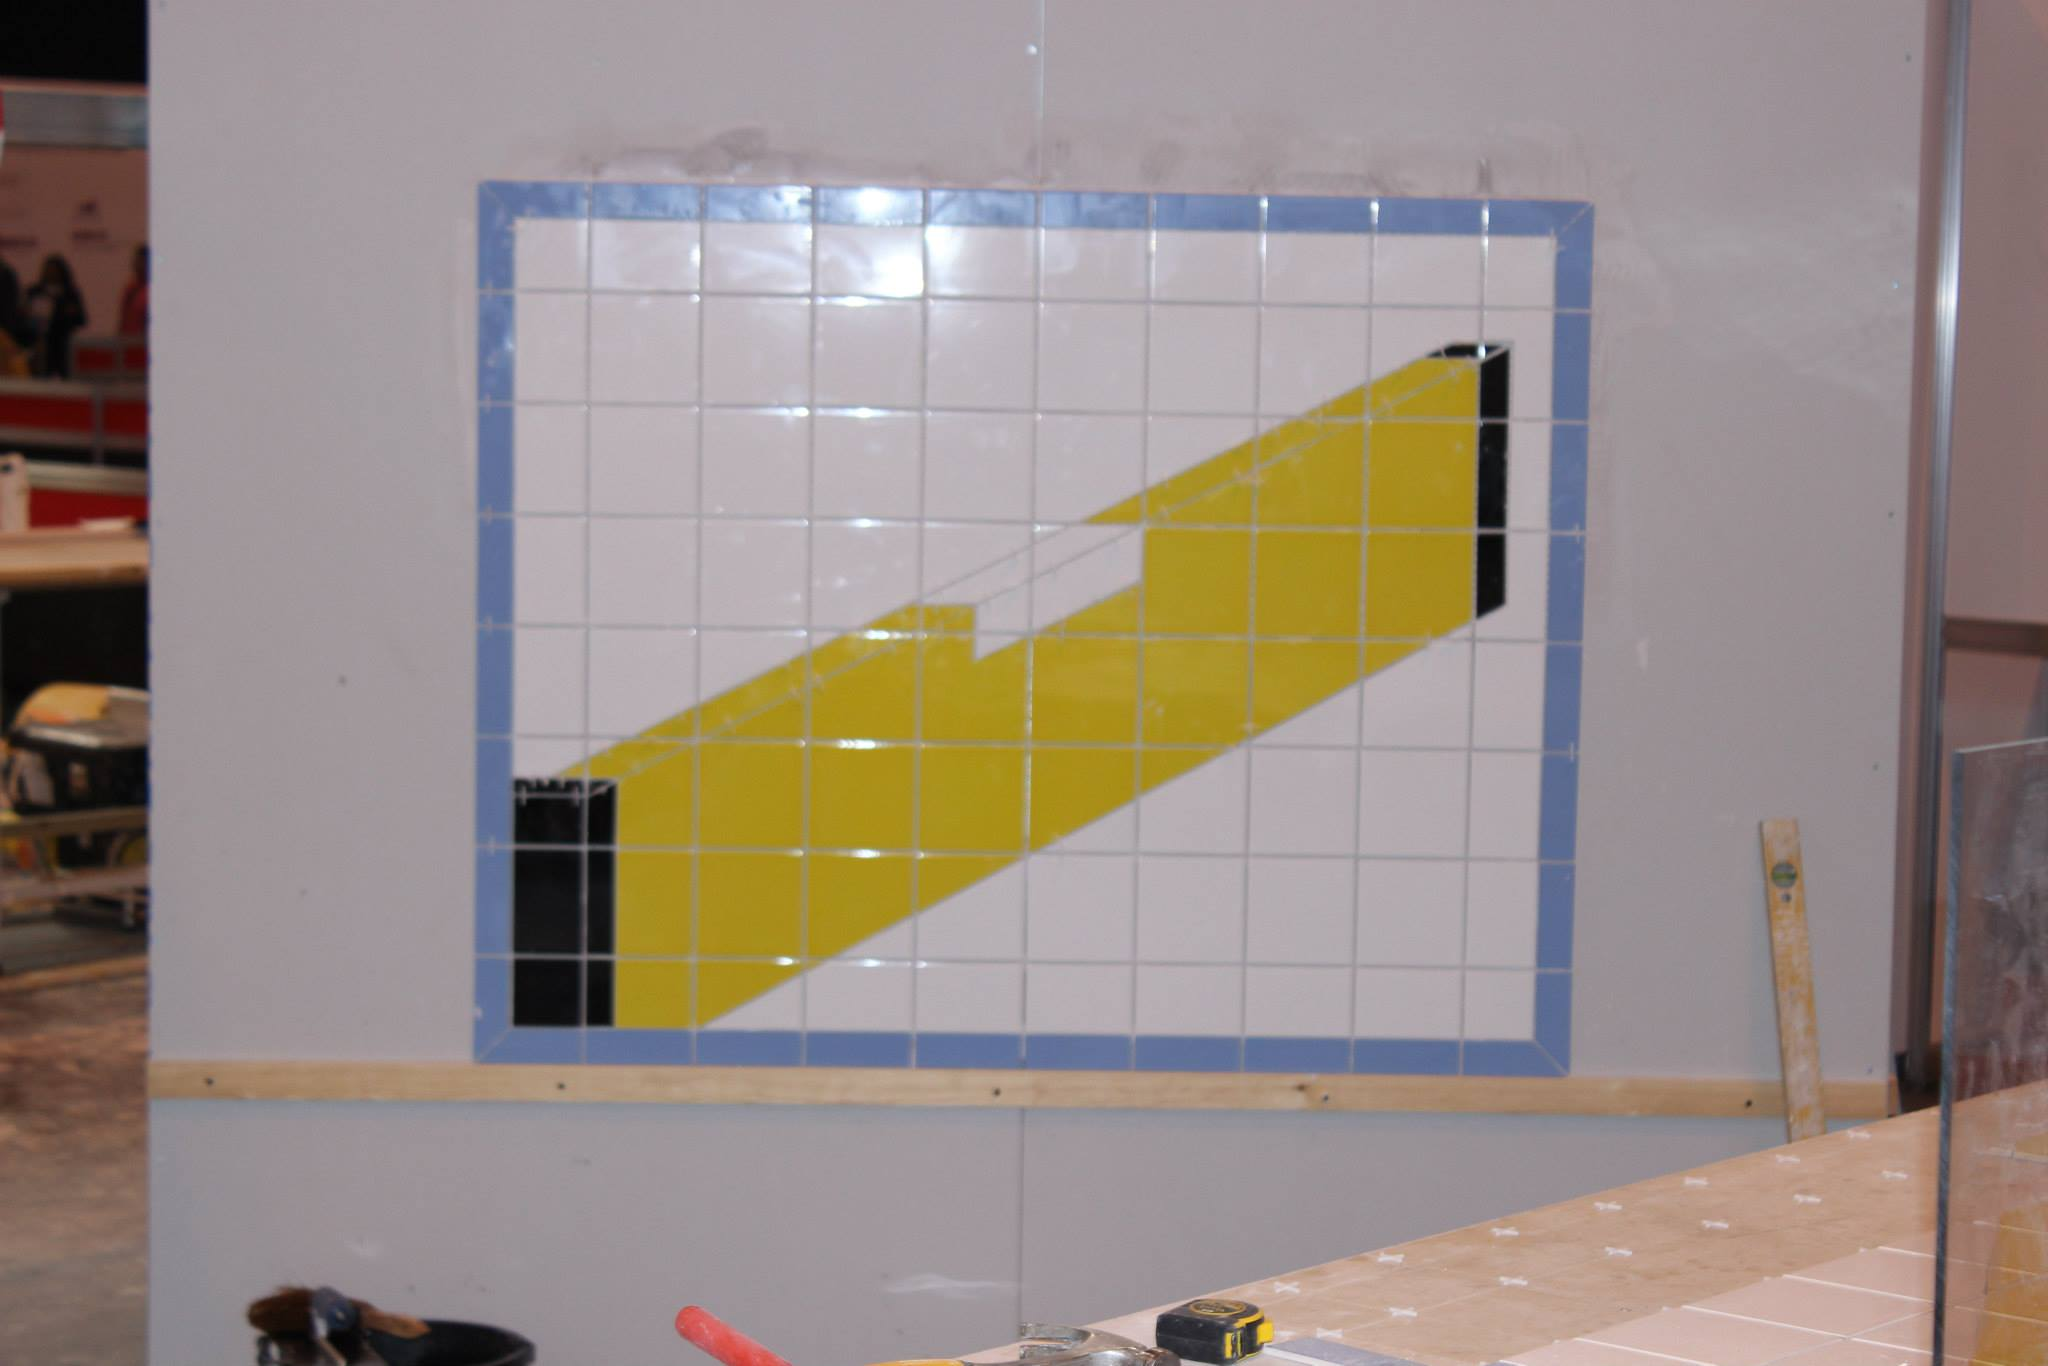 Tilers Doing impressive work